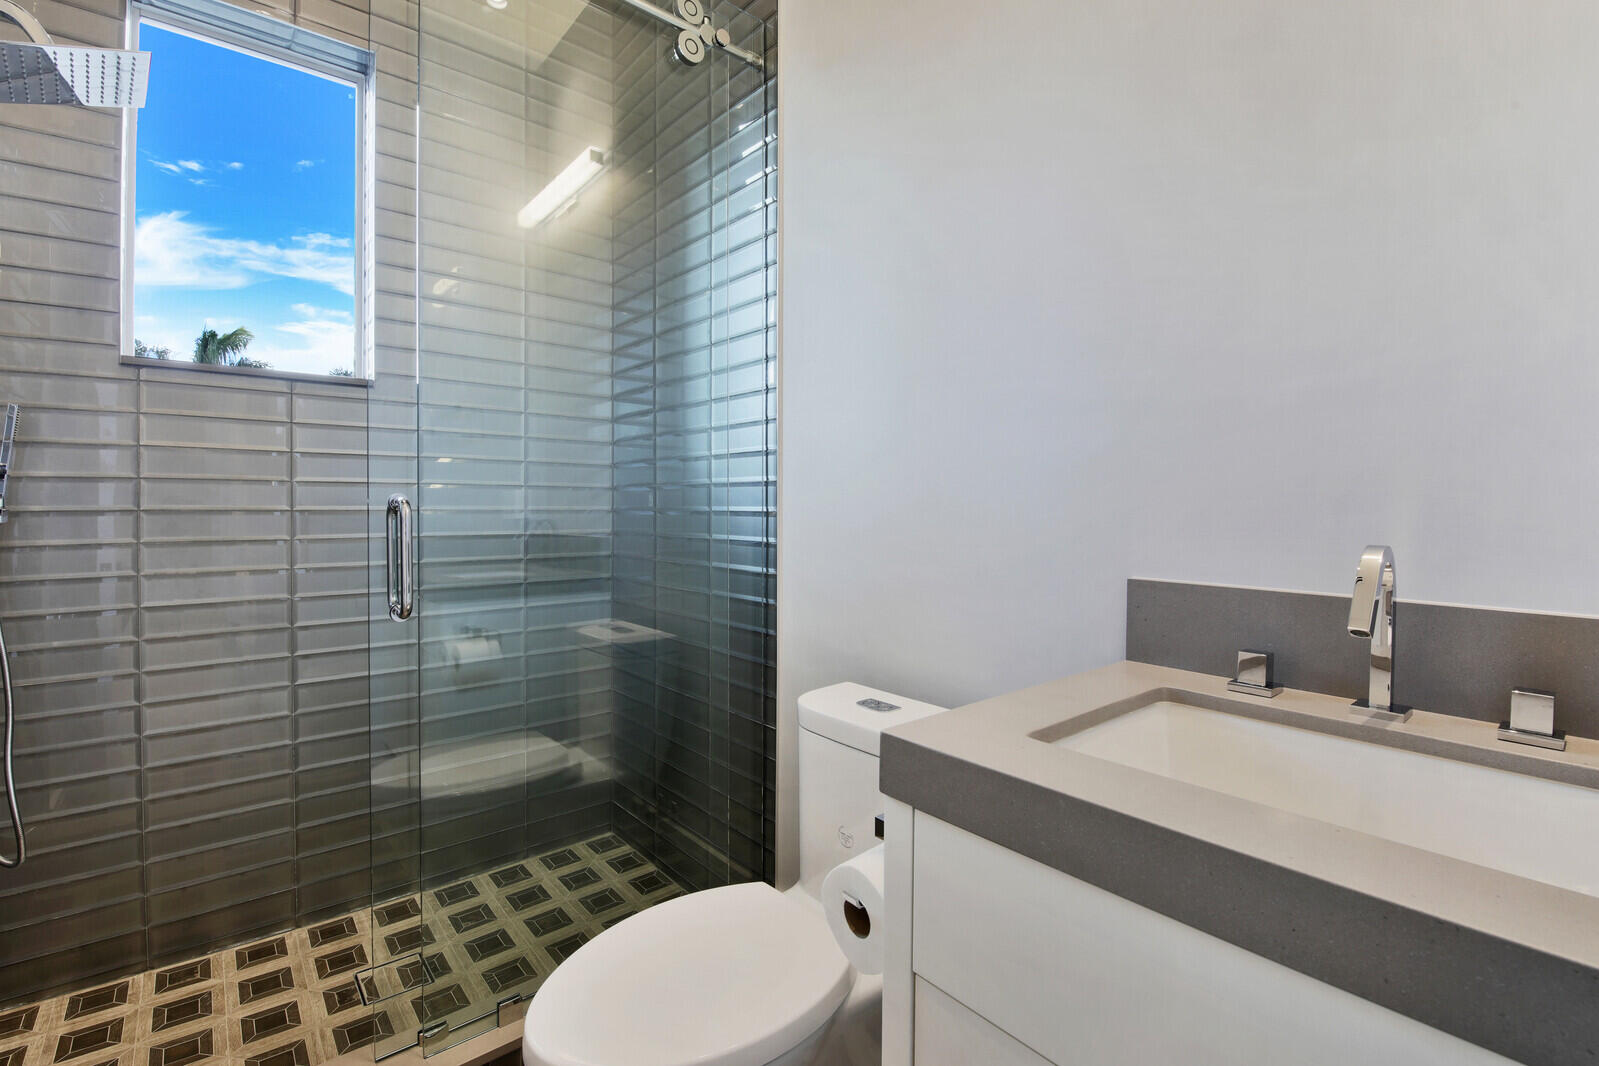 Office Bath